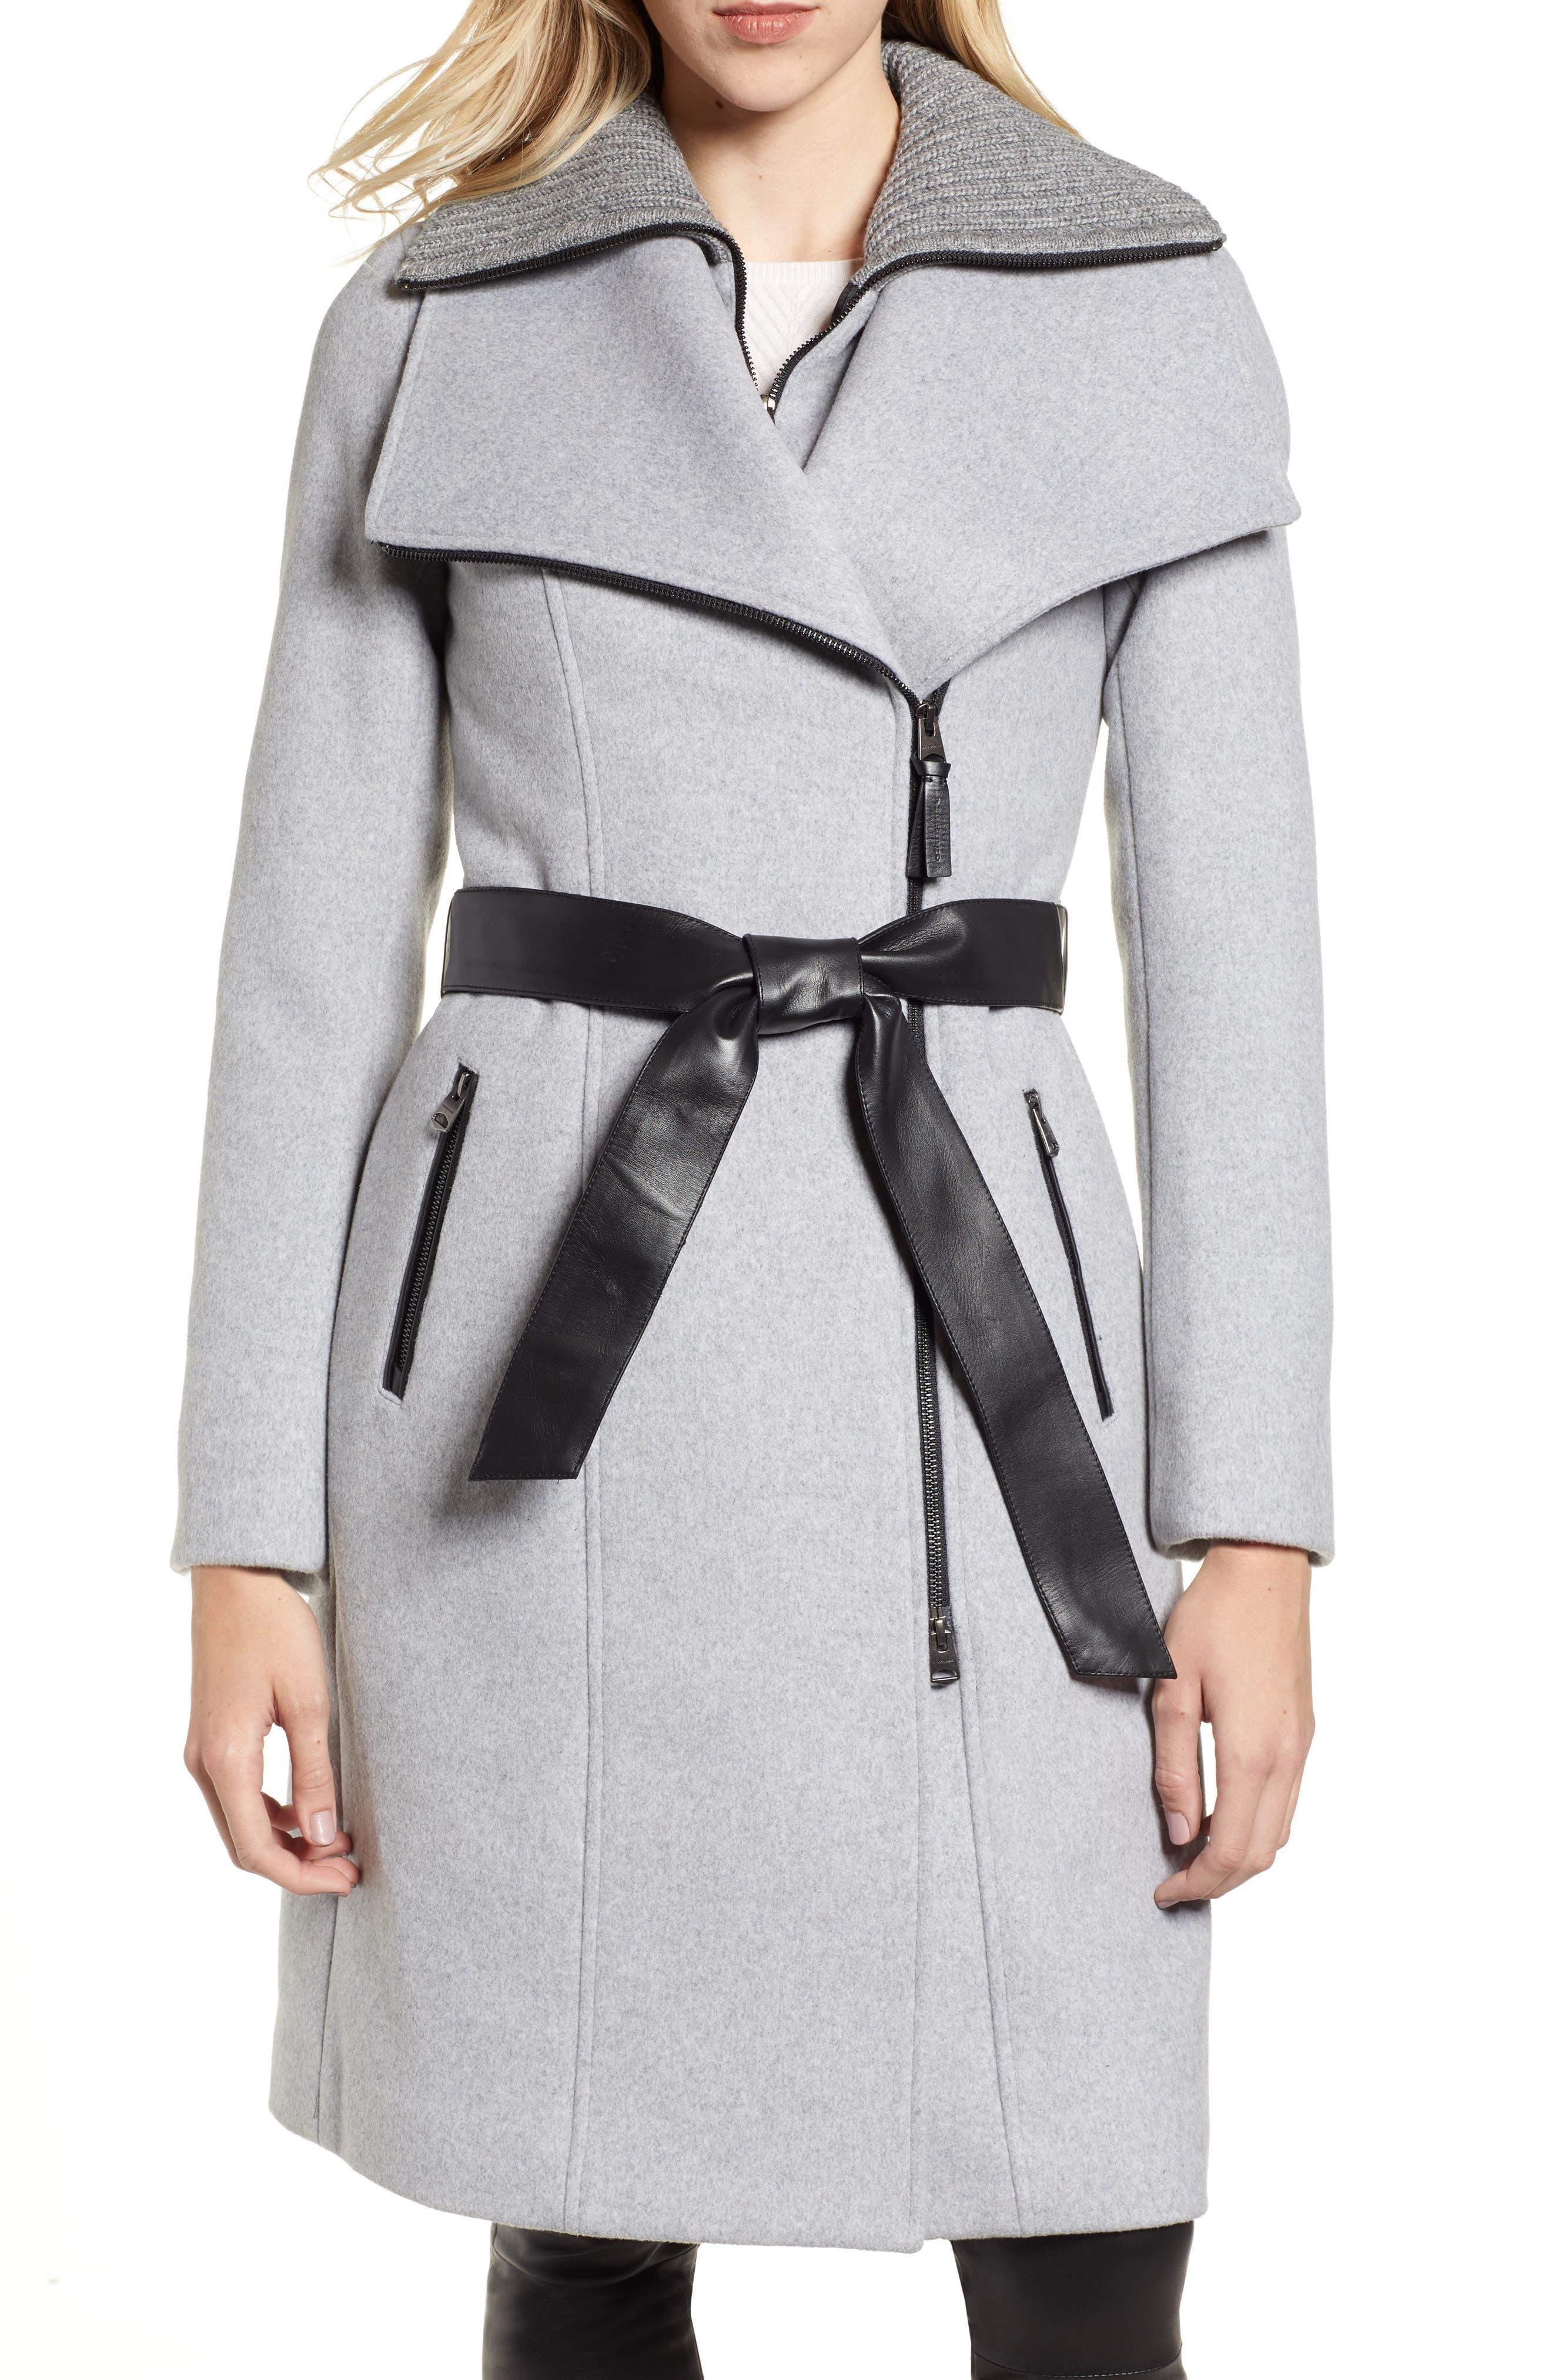 MACKAGE, Nori Belted Wool Blend Coat, Main thumbnail 1, color, LIGHT GREY